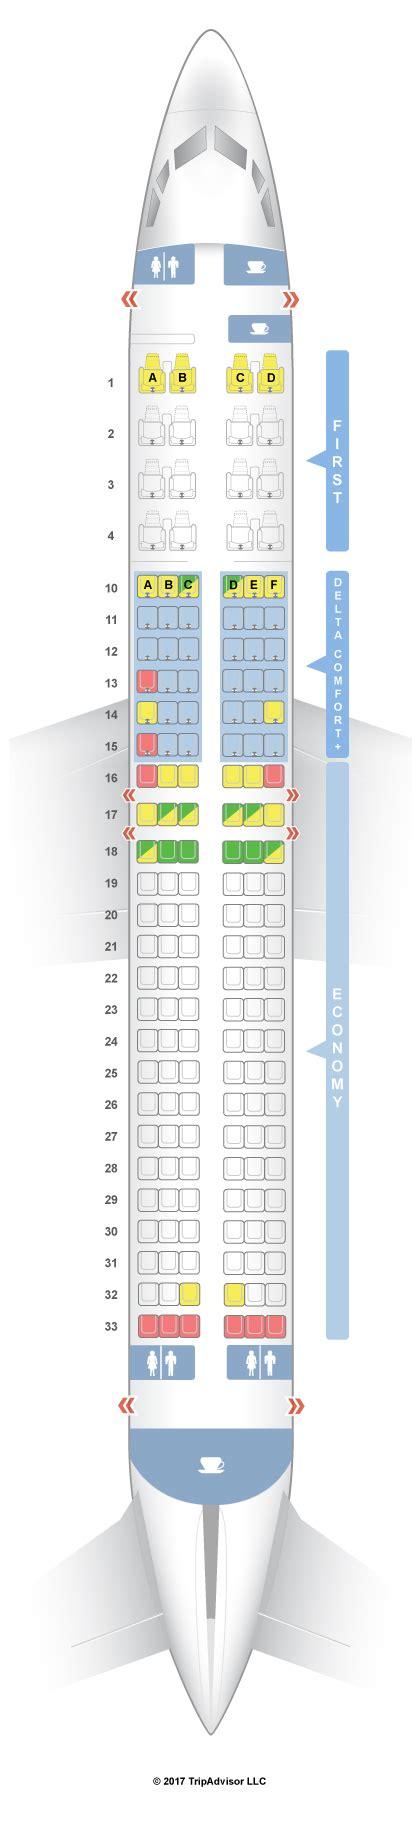 seating guru seatguru seat map delta boeing 737 800 73h